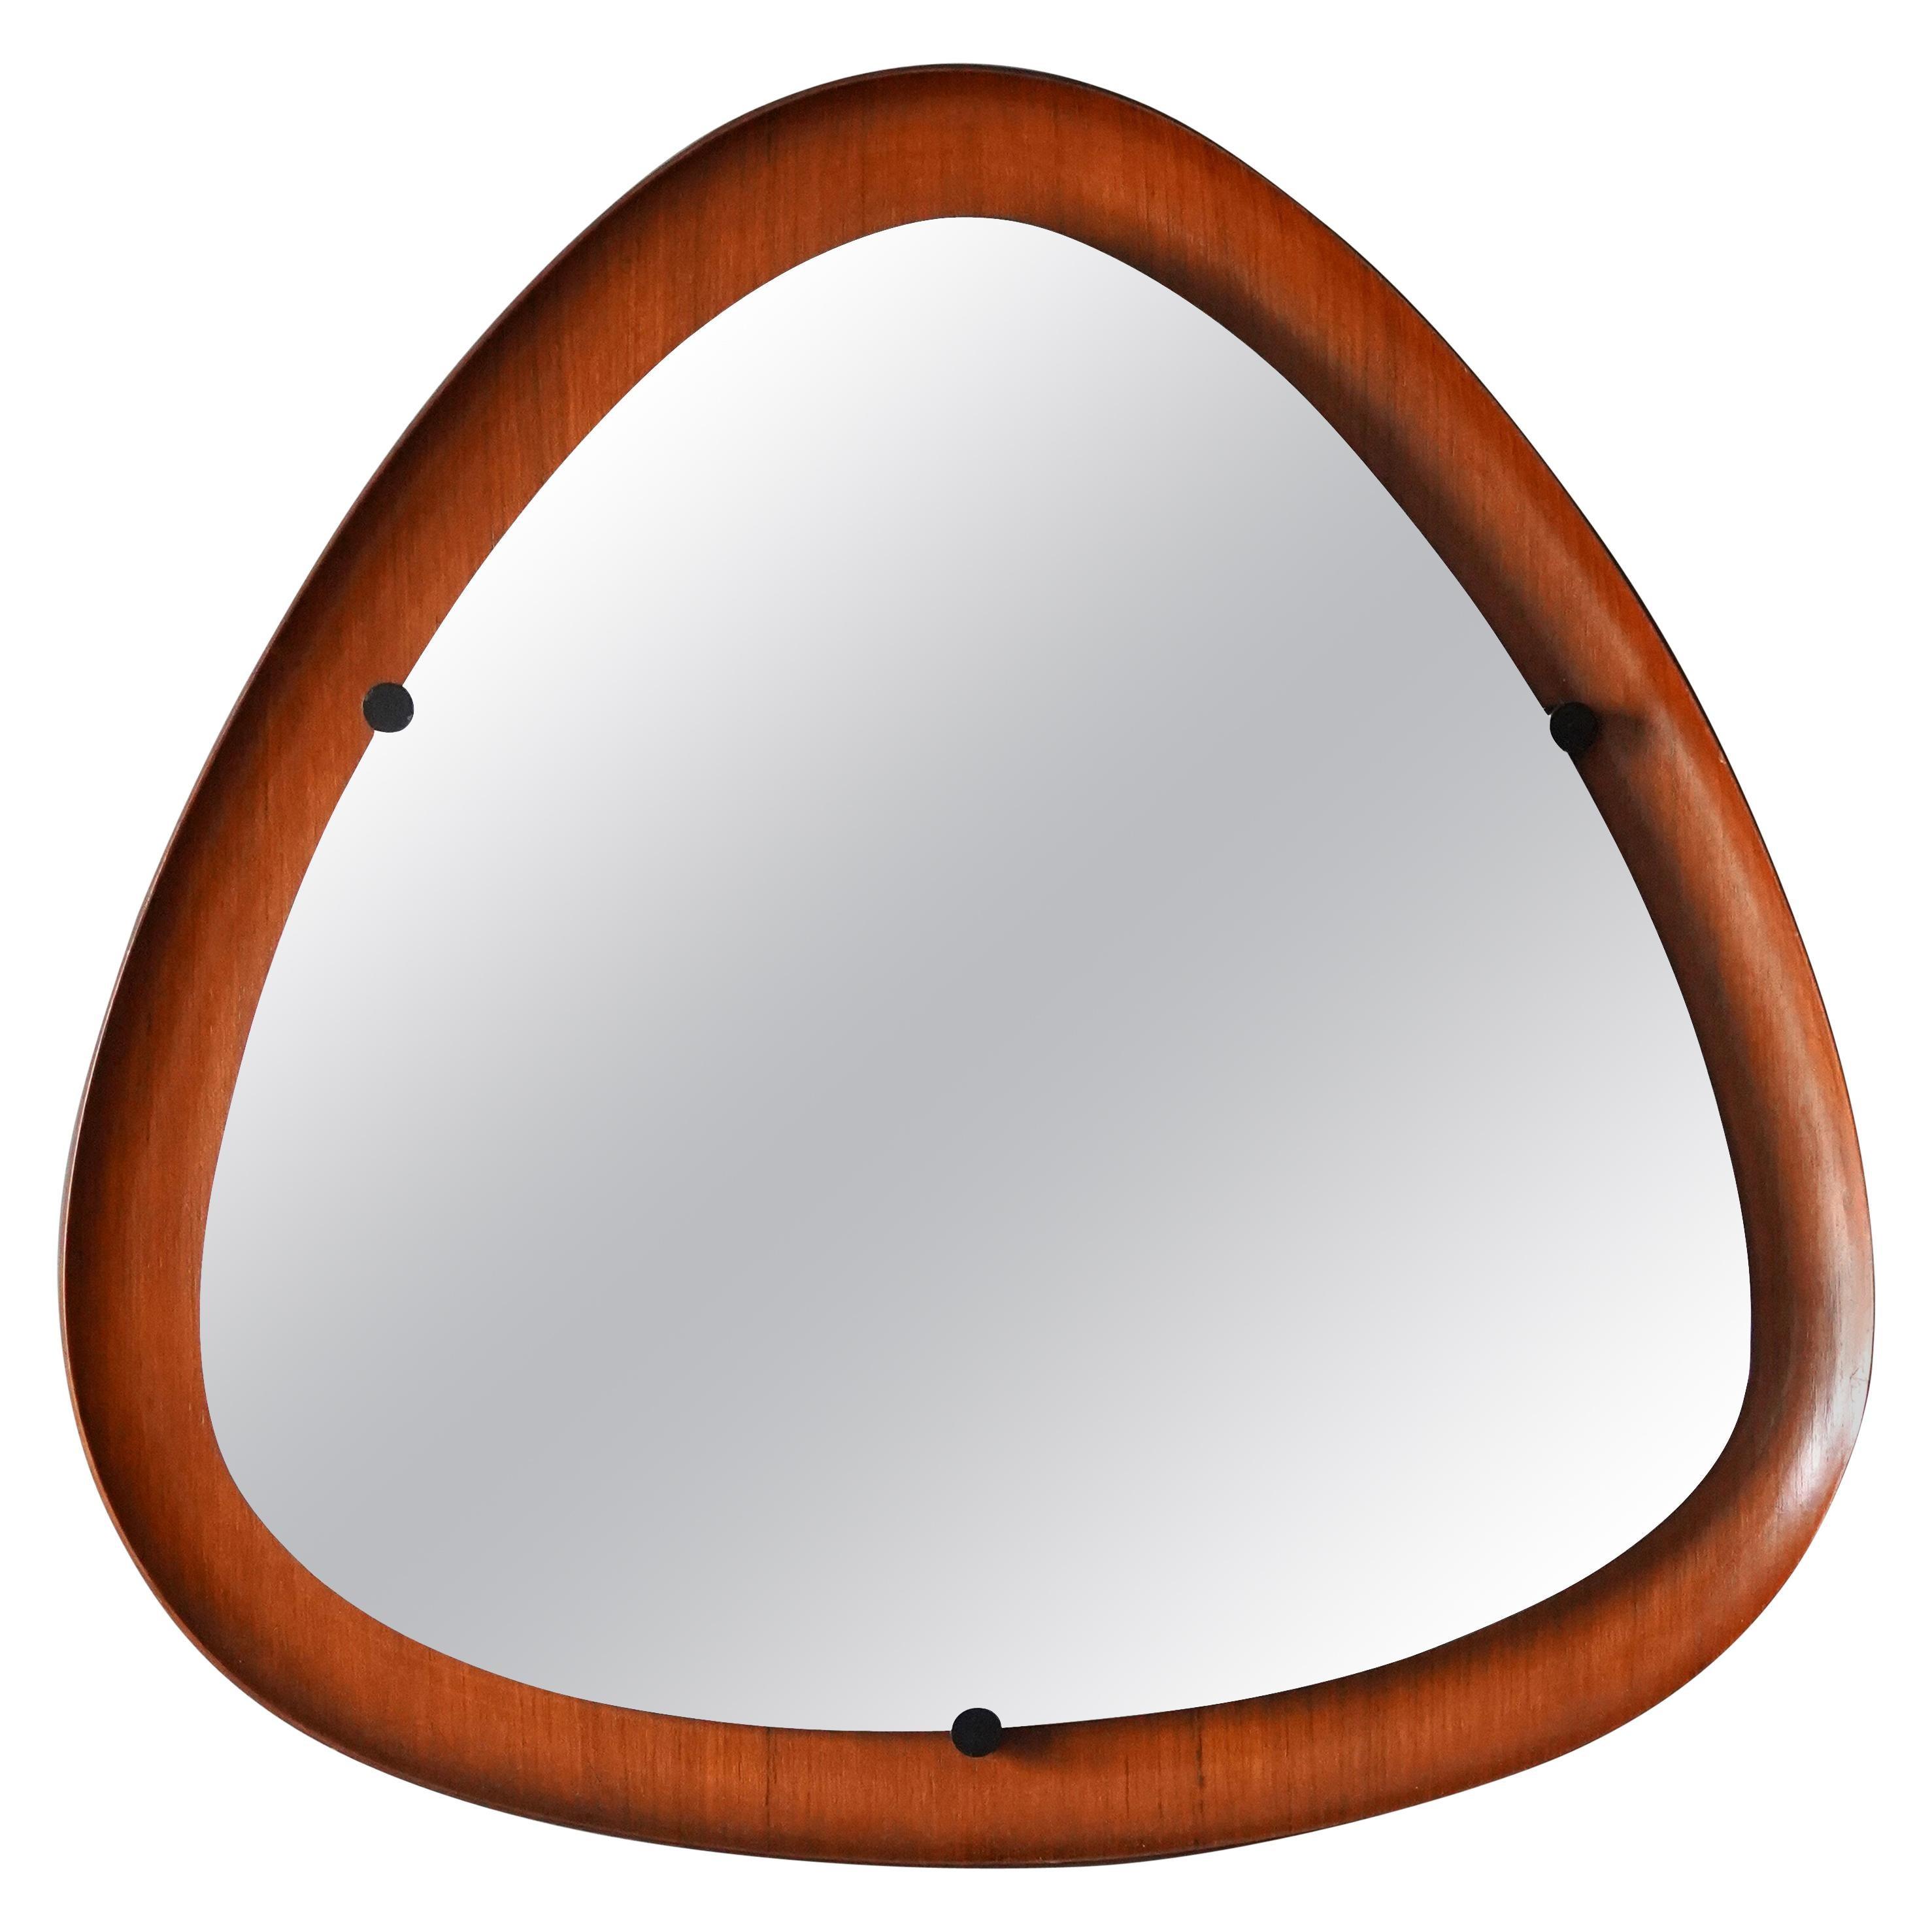 Italian, Modernist Wall Mirror, Mirror Glass, Metal, Teak, Italy, 1950s